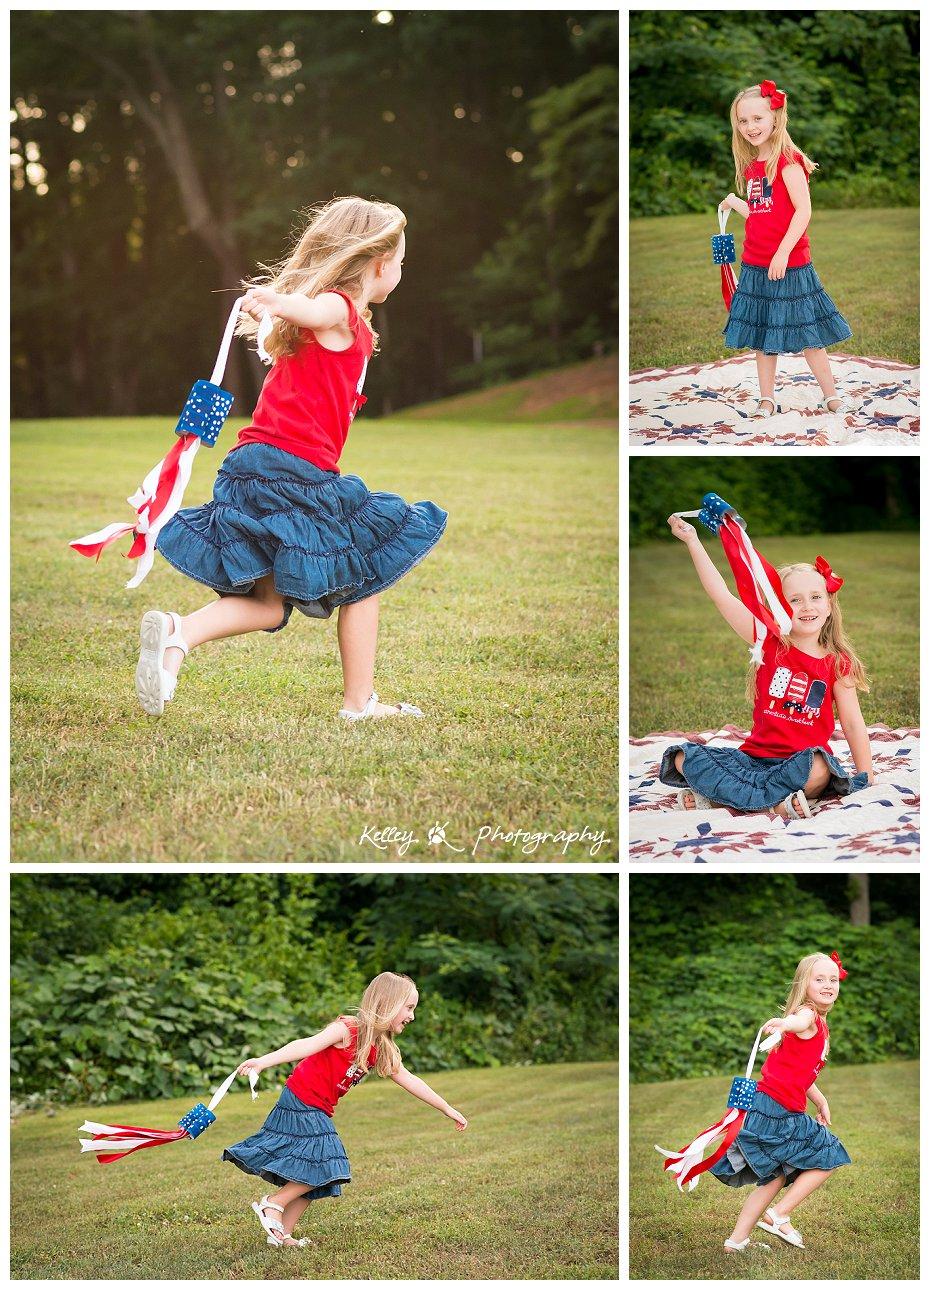 KelleyKPhotography_0078.jpg